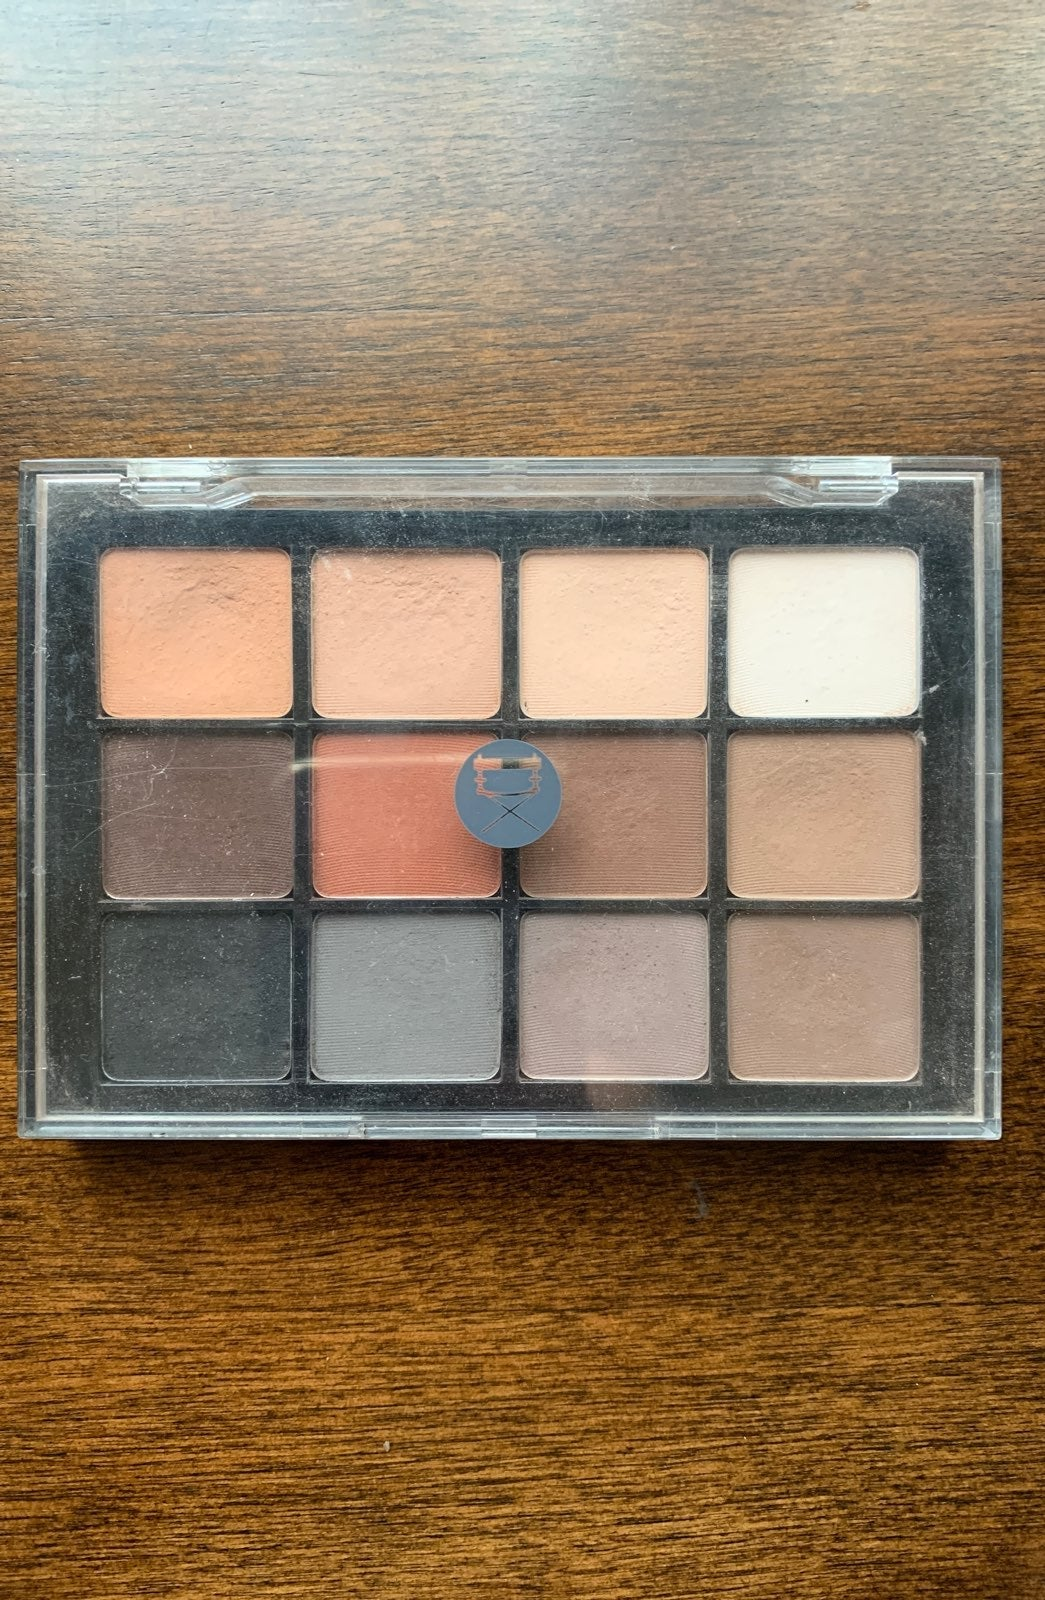 Viseart Neutral Matte Eyeshadow Palette